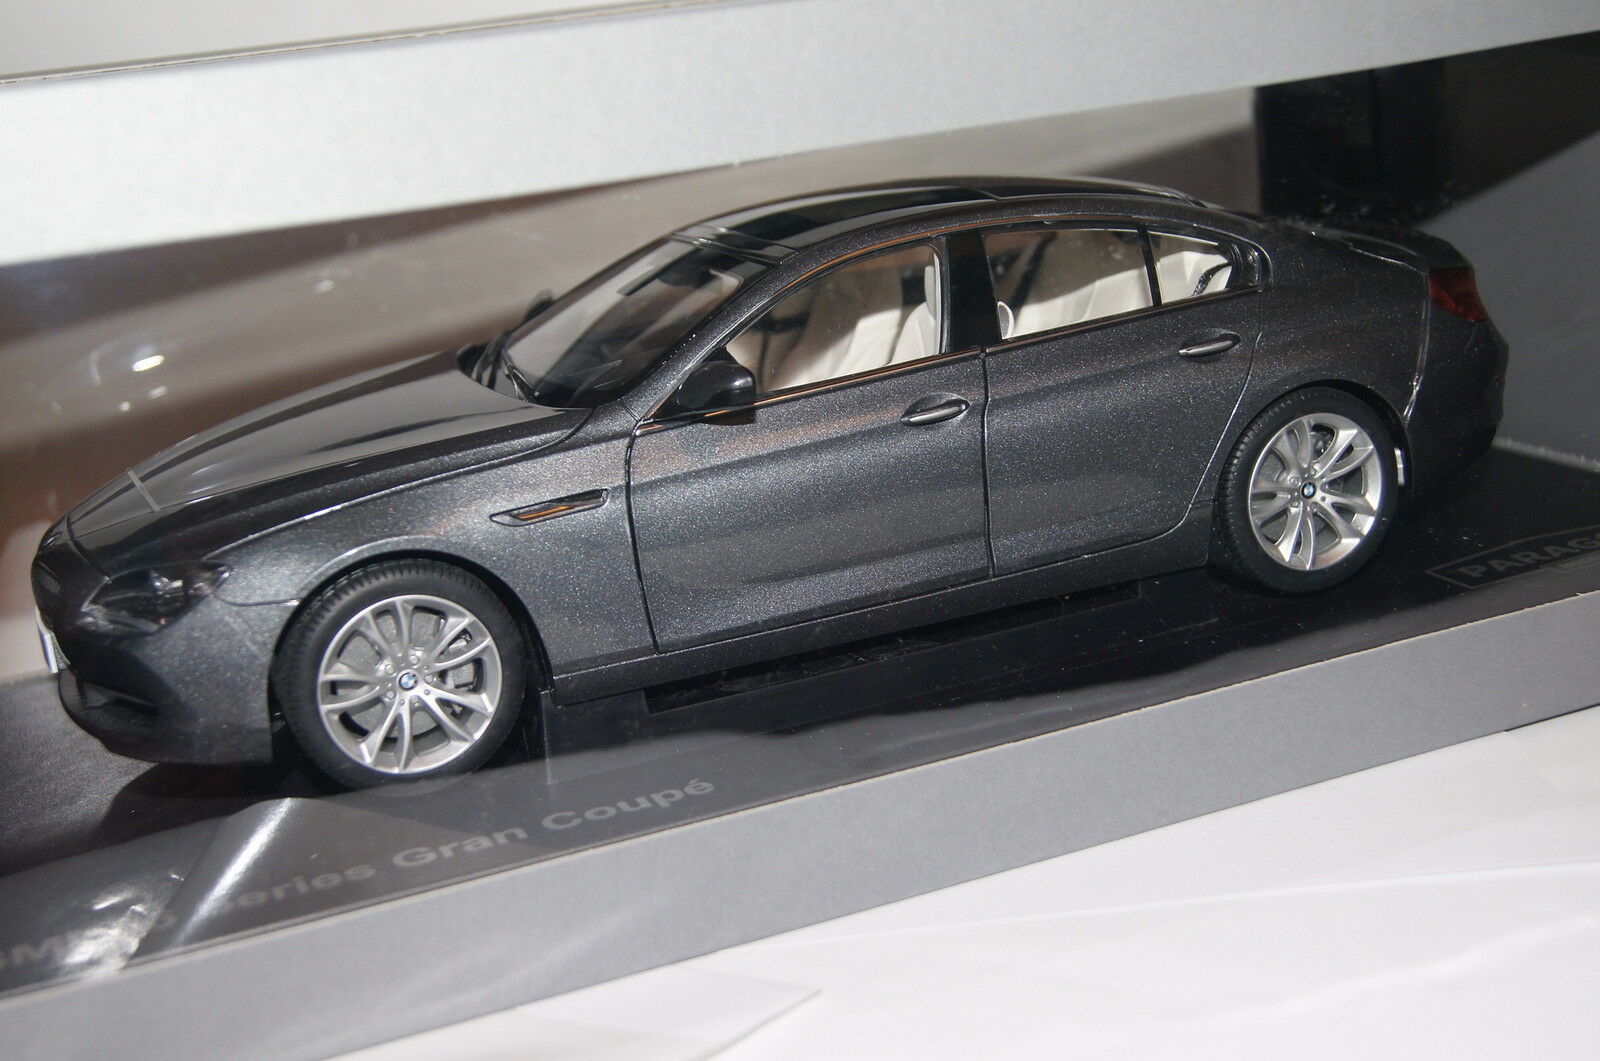 BMW 6er GRAN COUPE f06 2013 Space Grigio 1 18 18 18 Paragon NUOVO & OVP 97031 335941